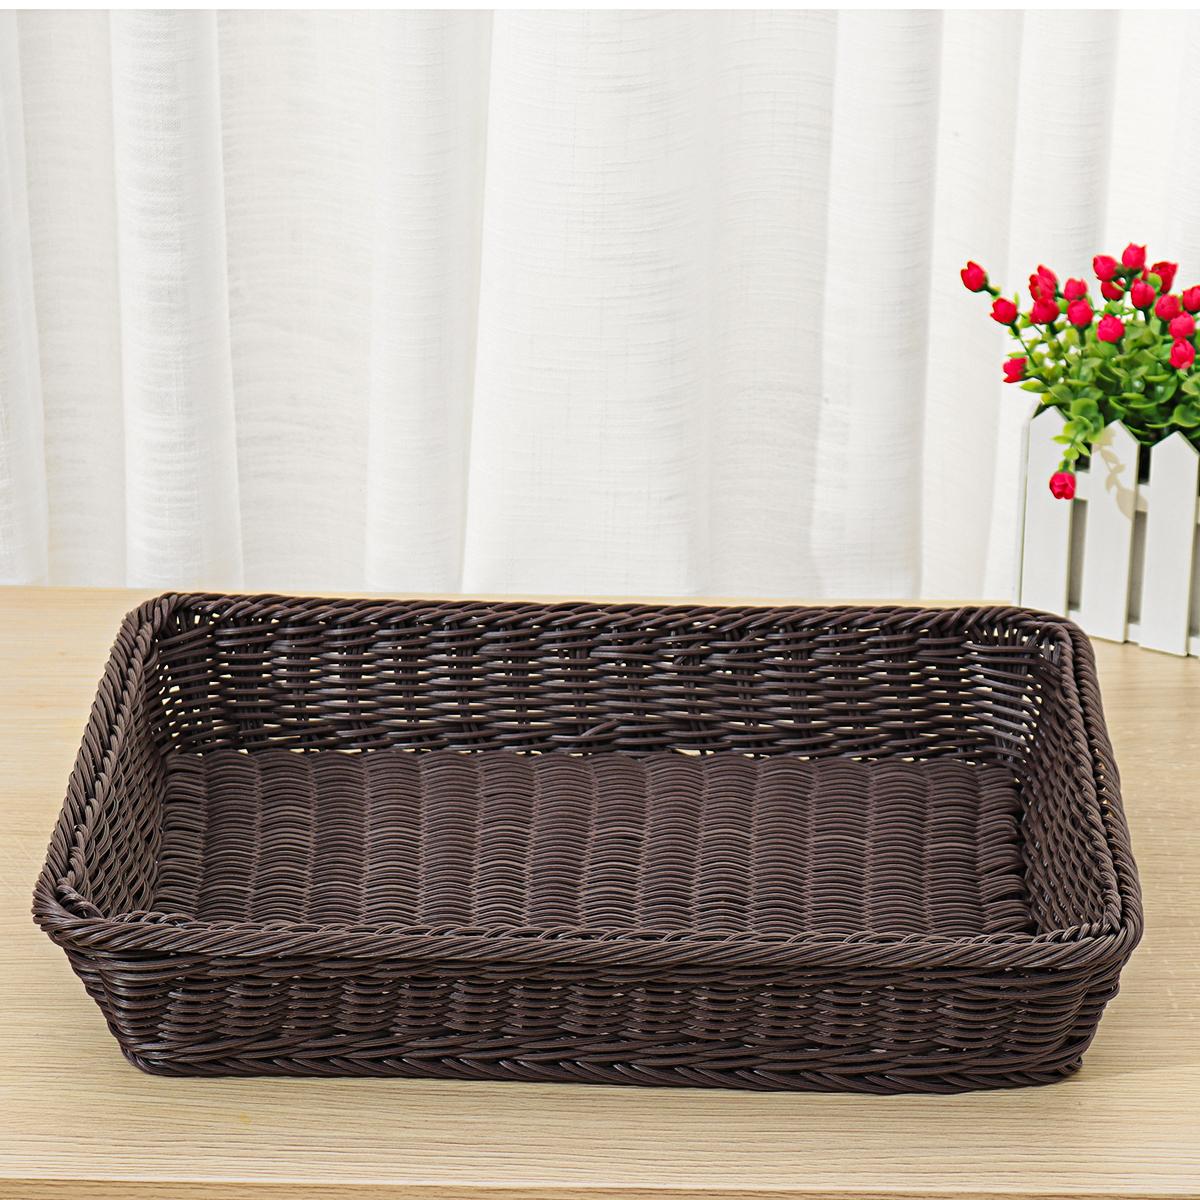 Rattan Storage Basket Handmade Vegetable Fruit Bread Food Snacks Organizer Box